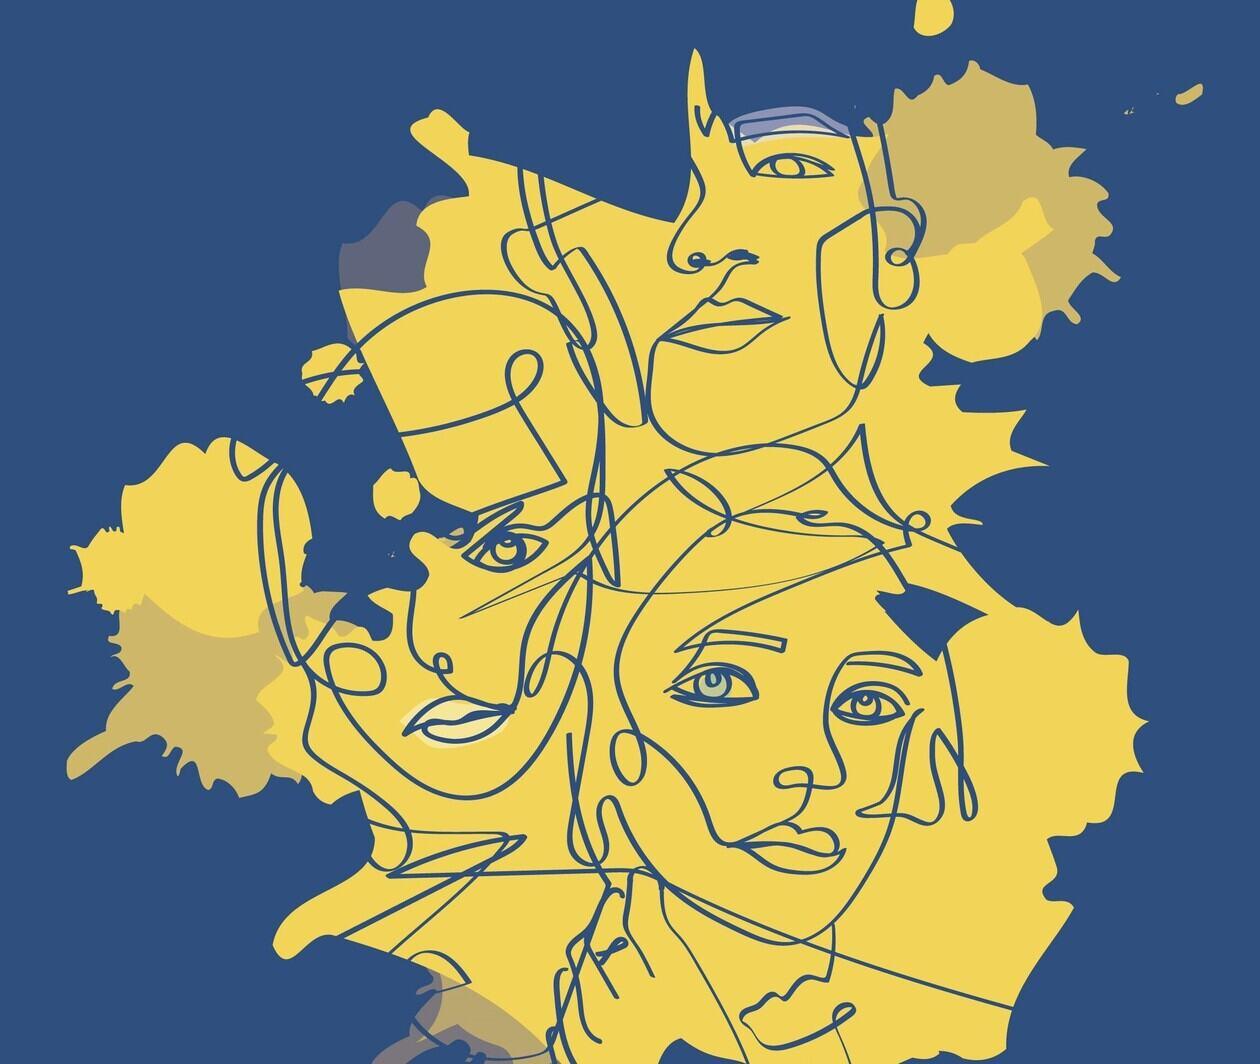 Global Intimacies: Sex, Power, Gender and Migration